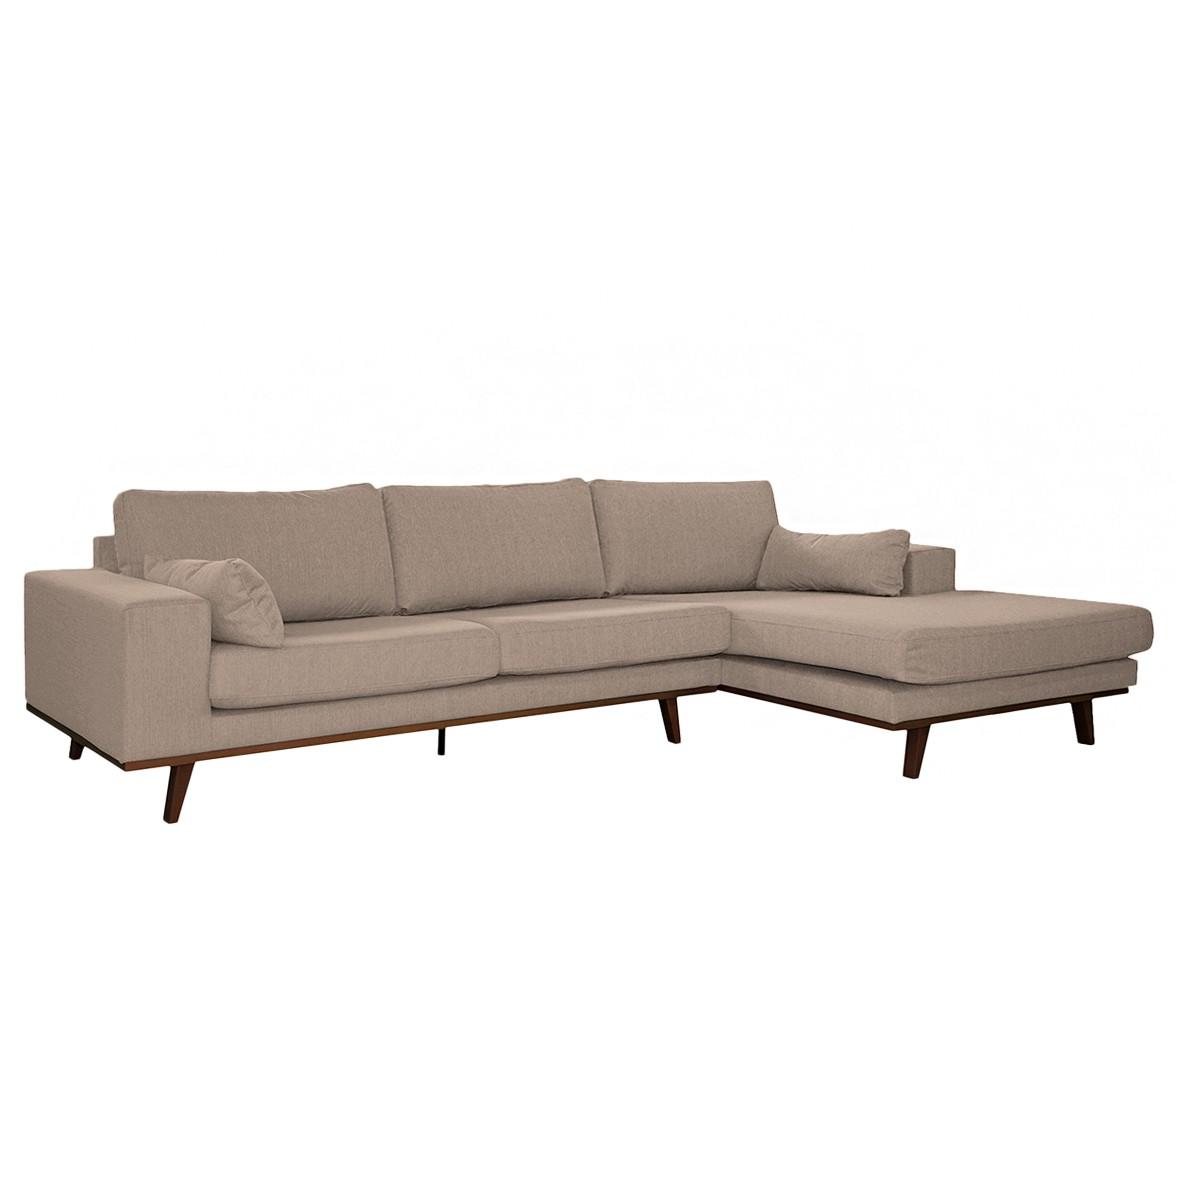 Canapé d'angle Billund II